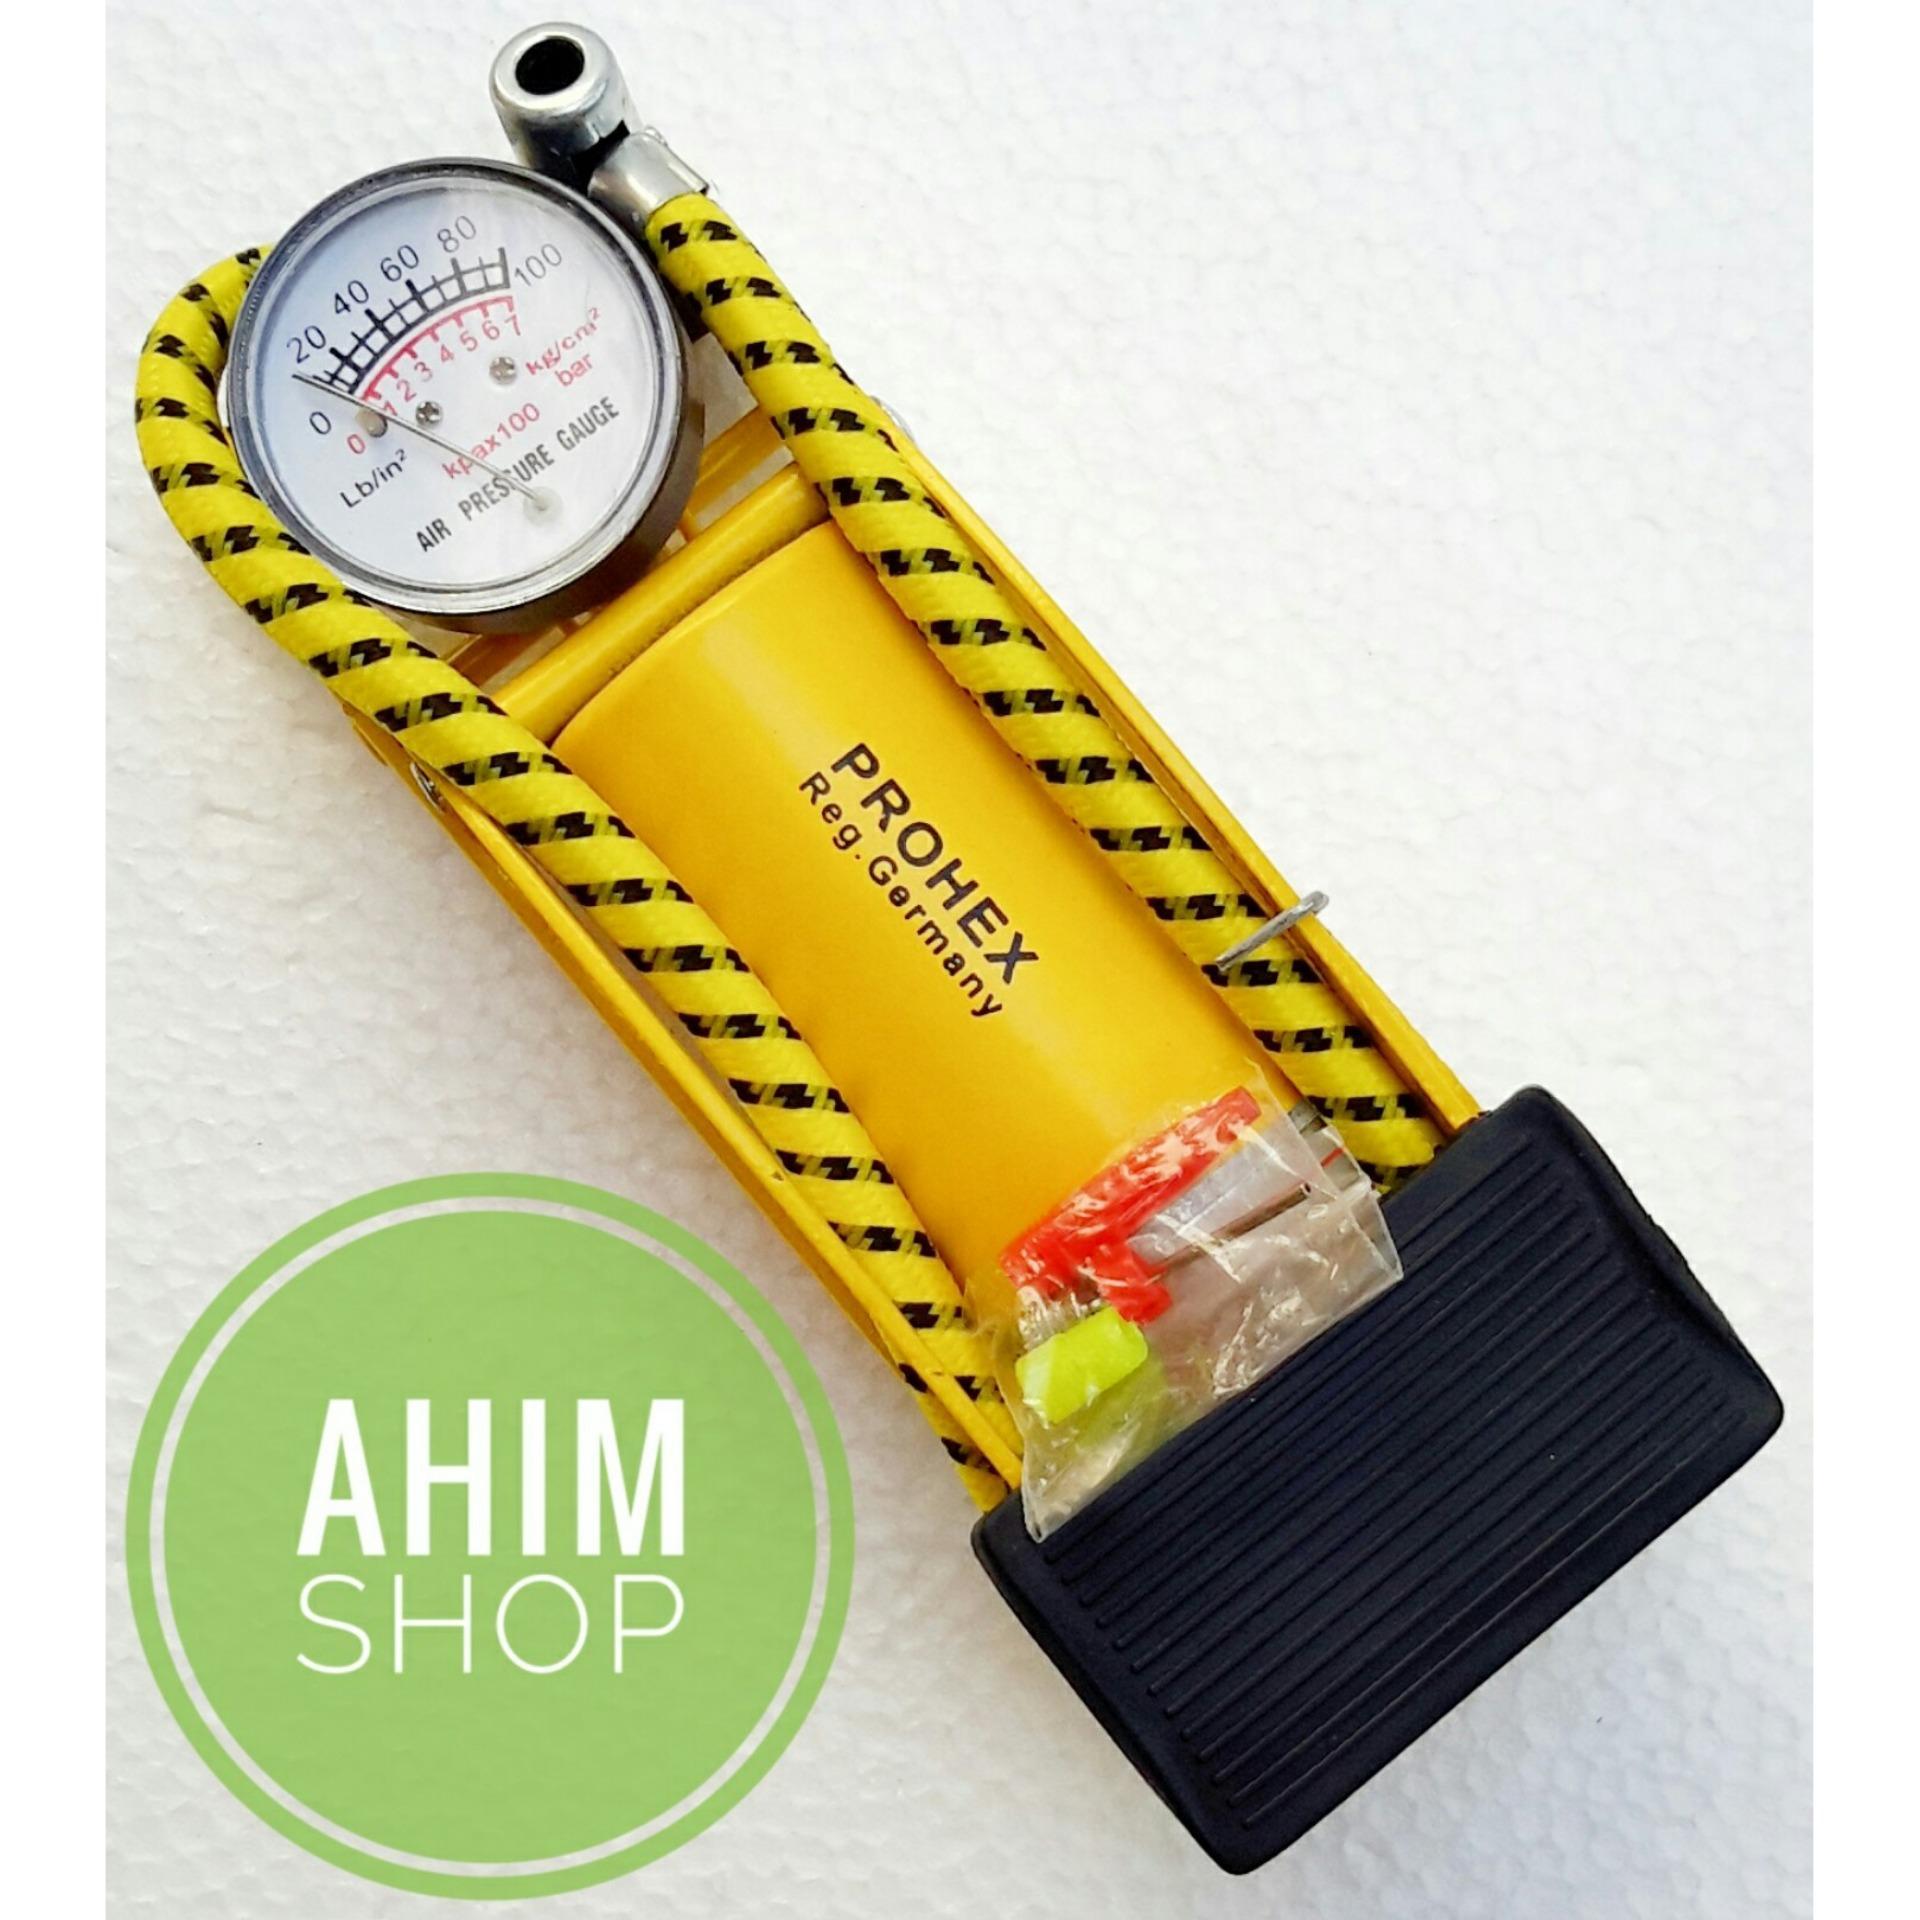 Price Checker Prohex Foot Pump Manual Multifungsi Pompa Angin Tabung Ban Kaki Injak Darurat Sepeda Motor